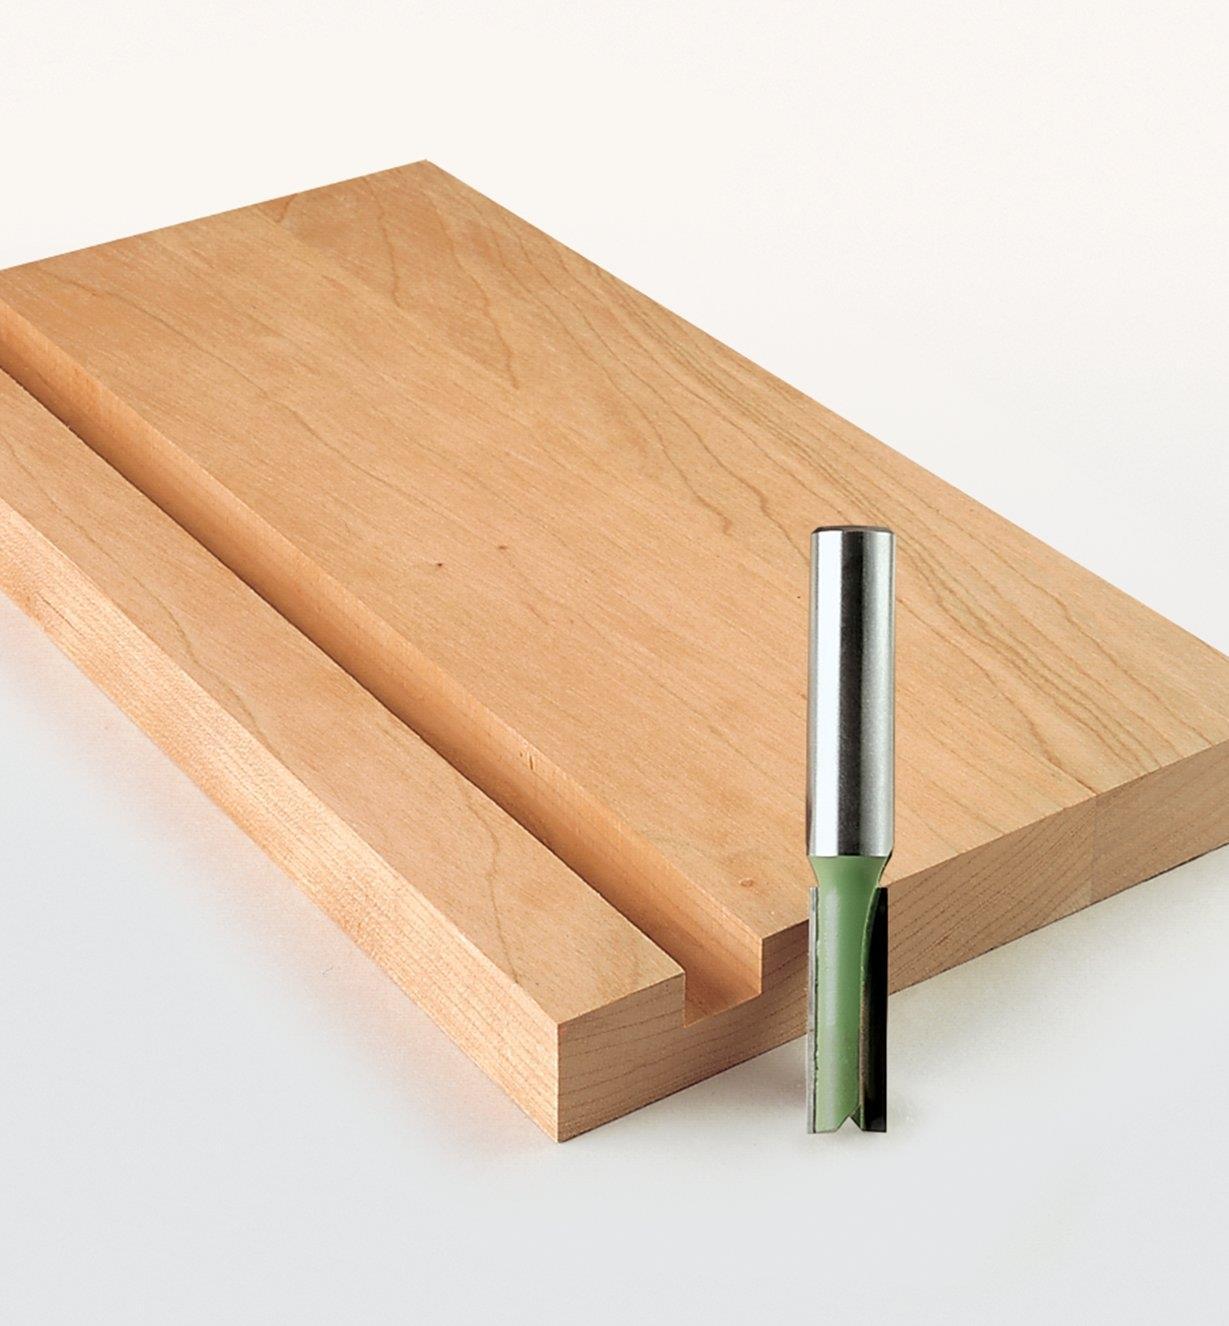 18J0780 - Mèche droite pour gabarits Leigh, 0,313po x 1,030po x 8mm